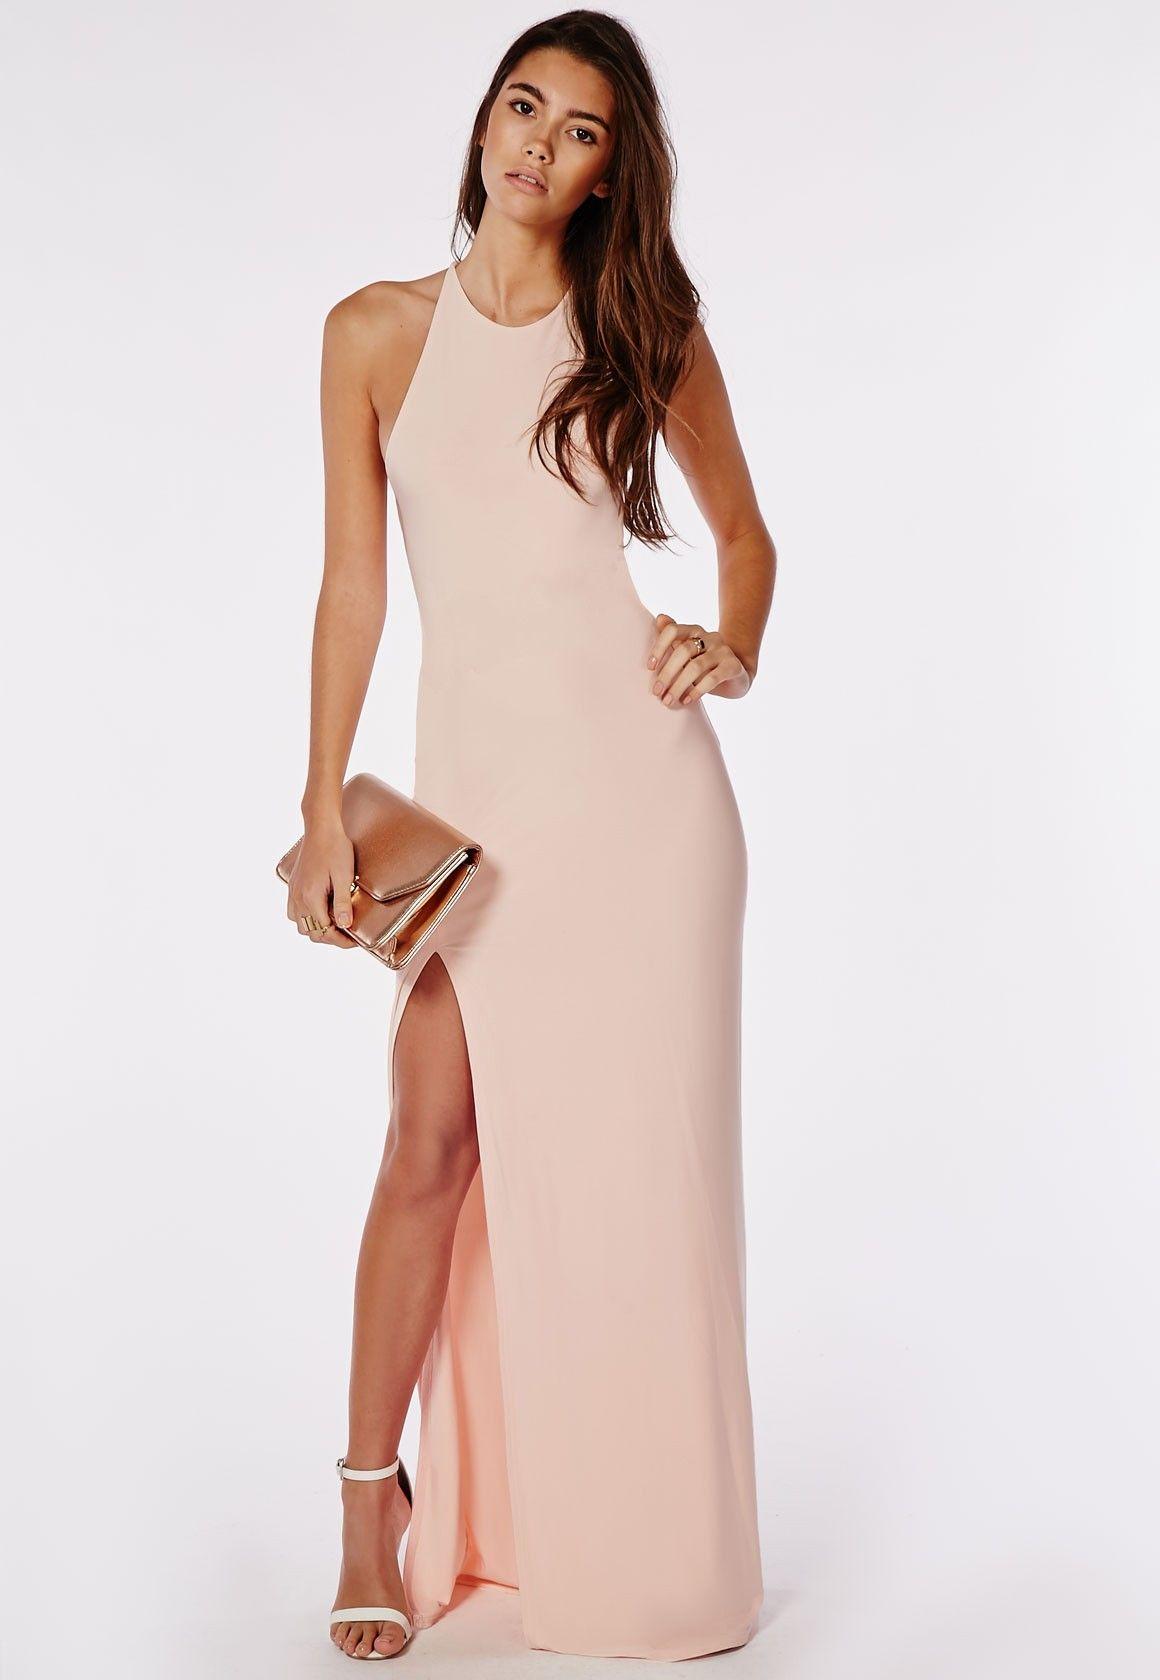 Slinky Side Split Maxi Dress Nude - Dresses - Maxi Dresses - Missguided d0d843984c76